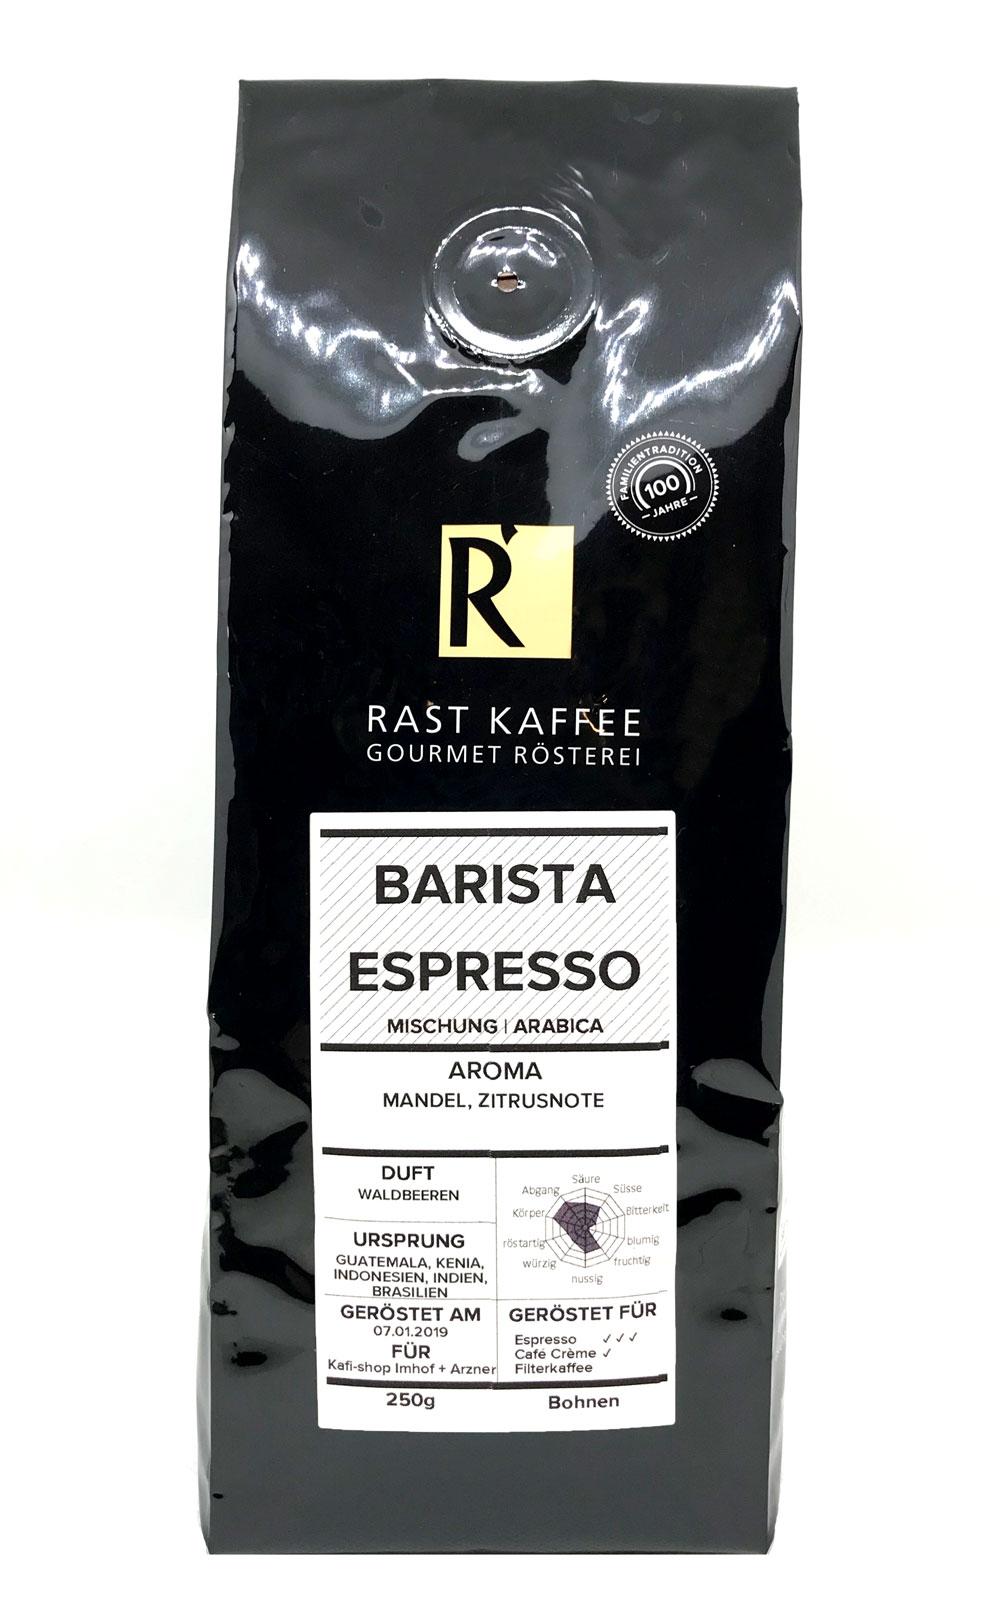 Barista Espresso 250g